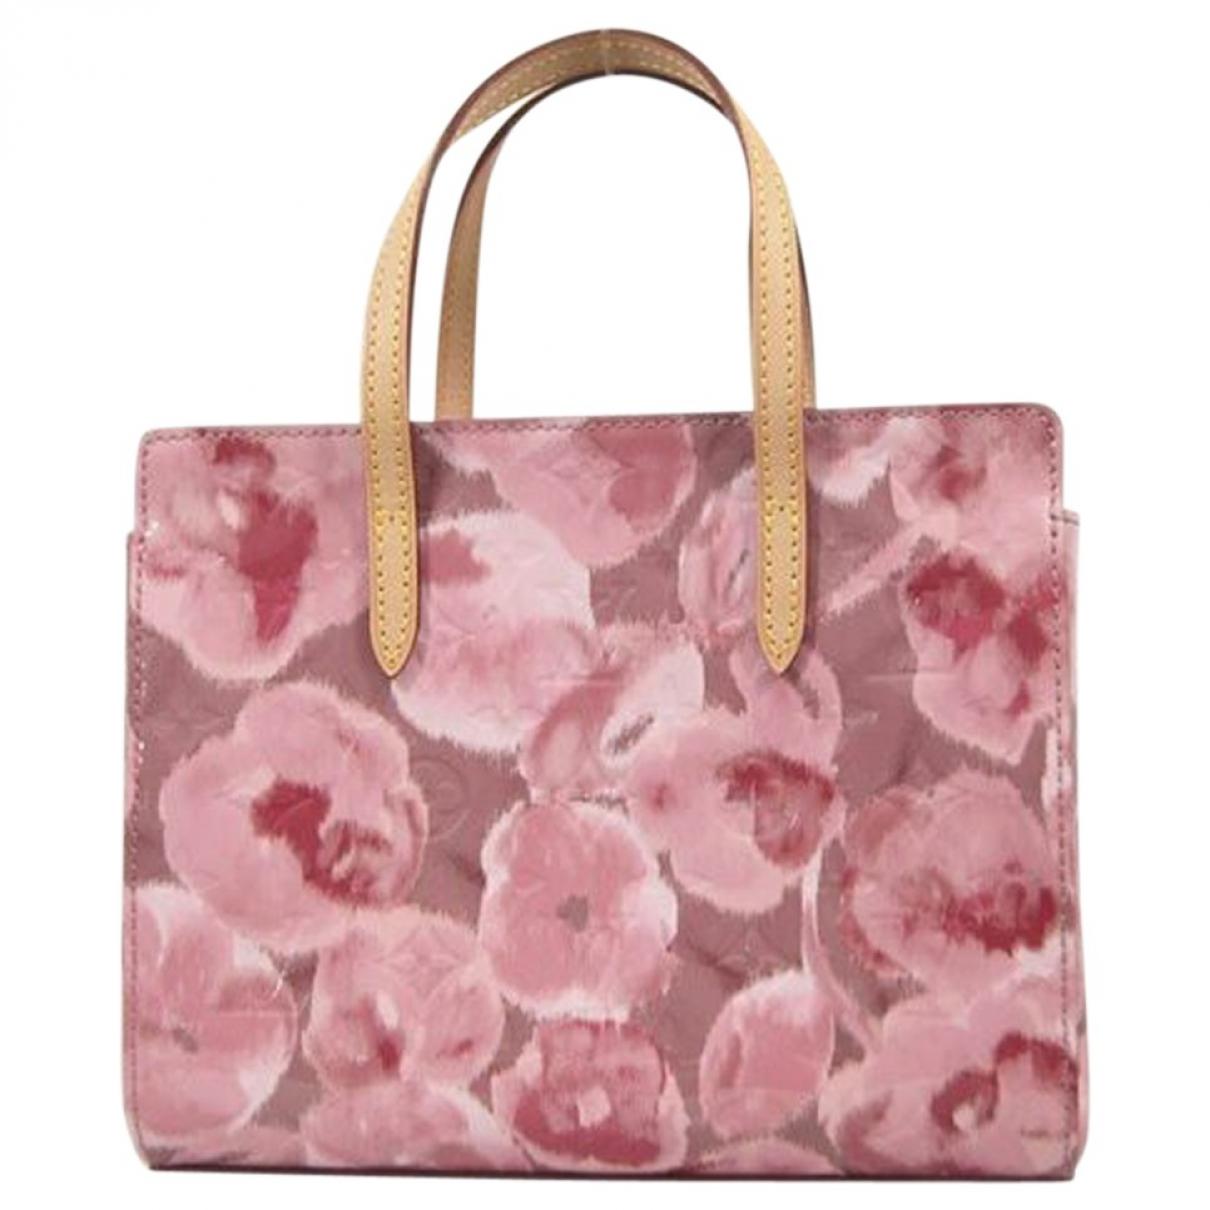 Louis Vuitton Catalina Pink Patent leather handbag for Women \N